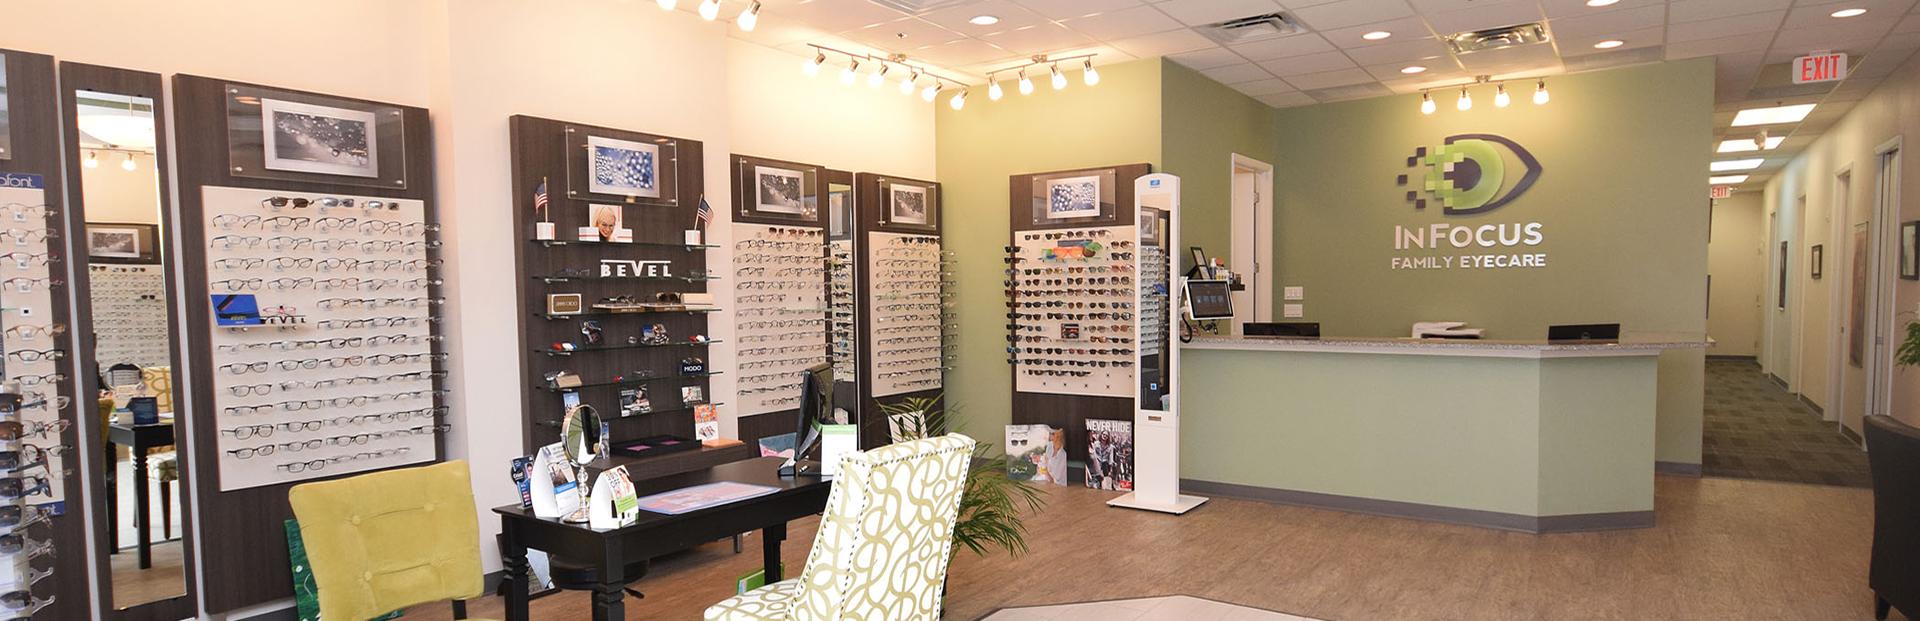 InFocus Eyecare